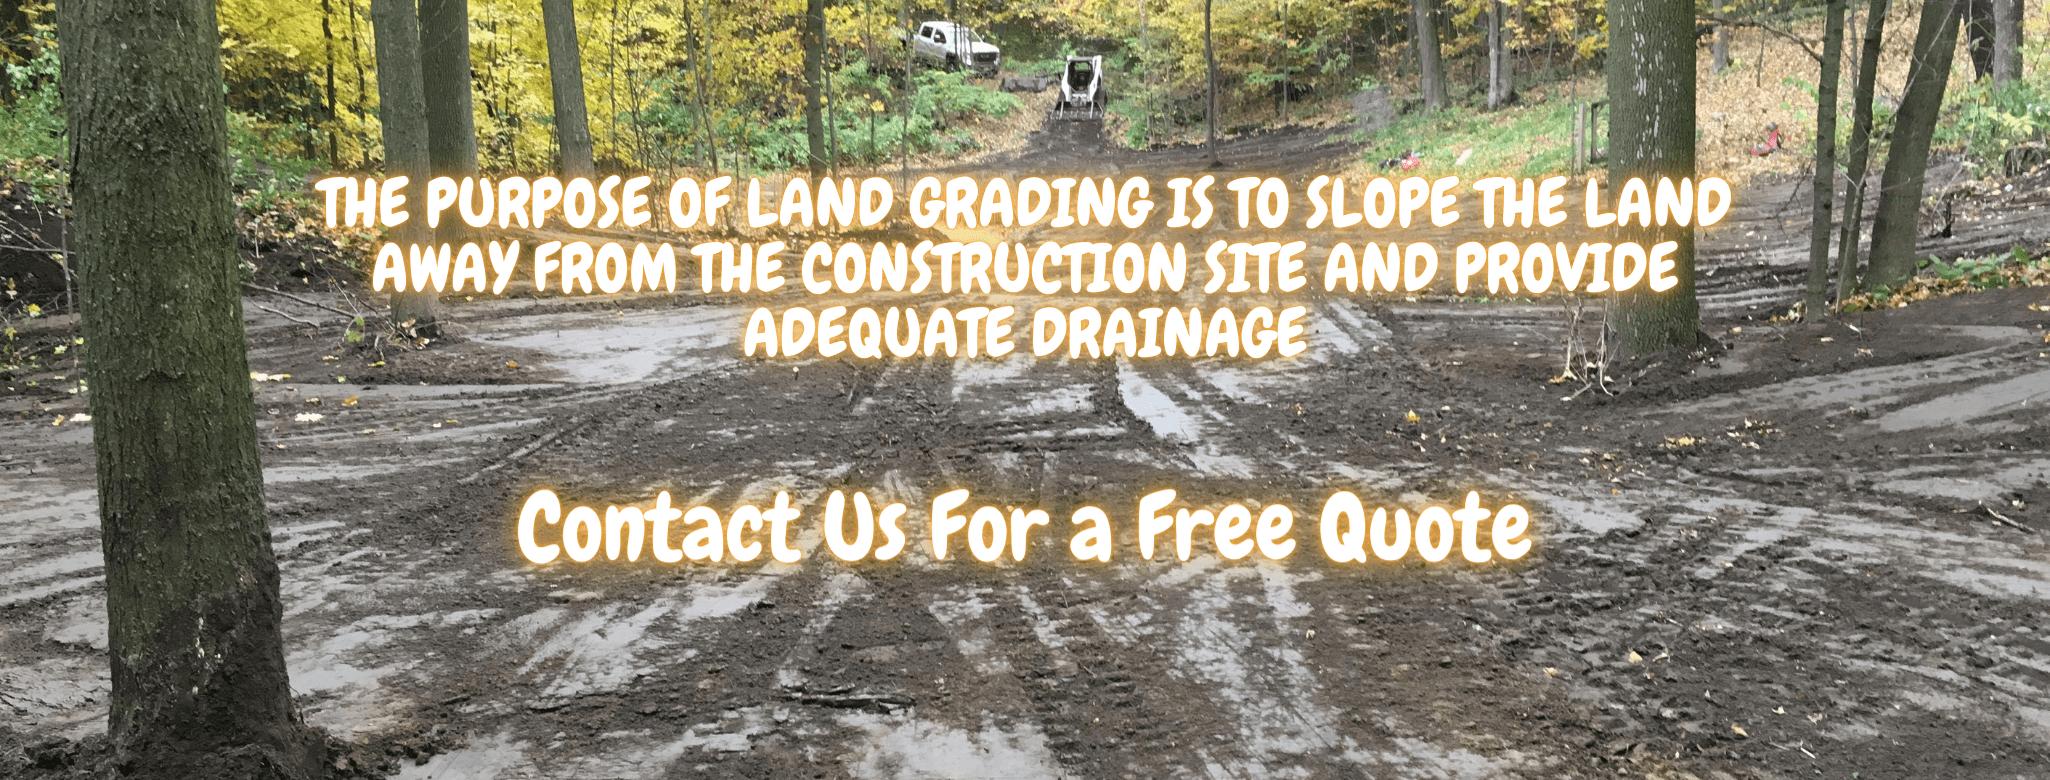 Land Grading